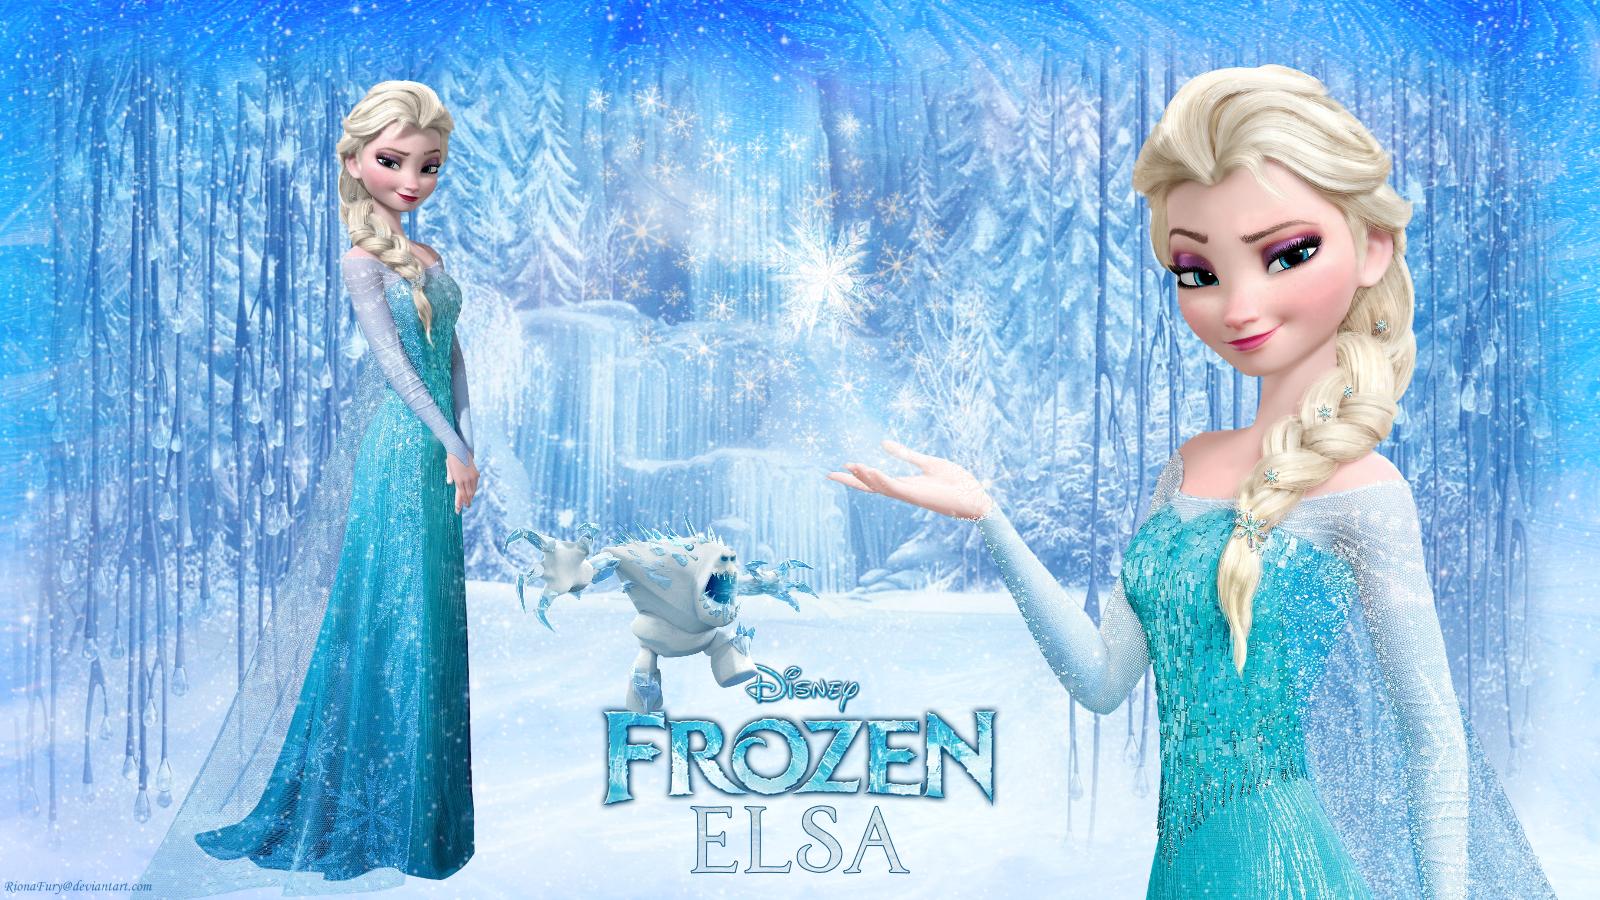 Frozen Elsa   Frozen Wallpaper 37732273 1600x900